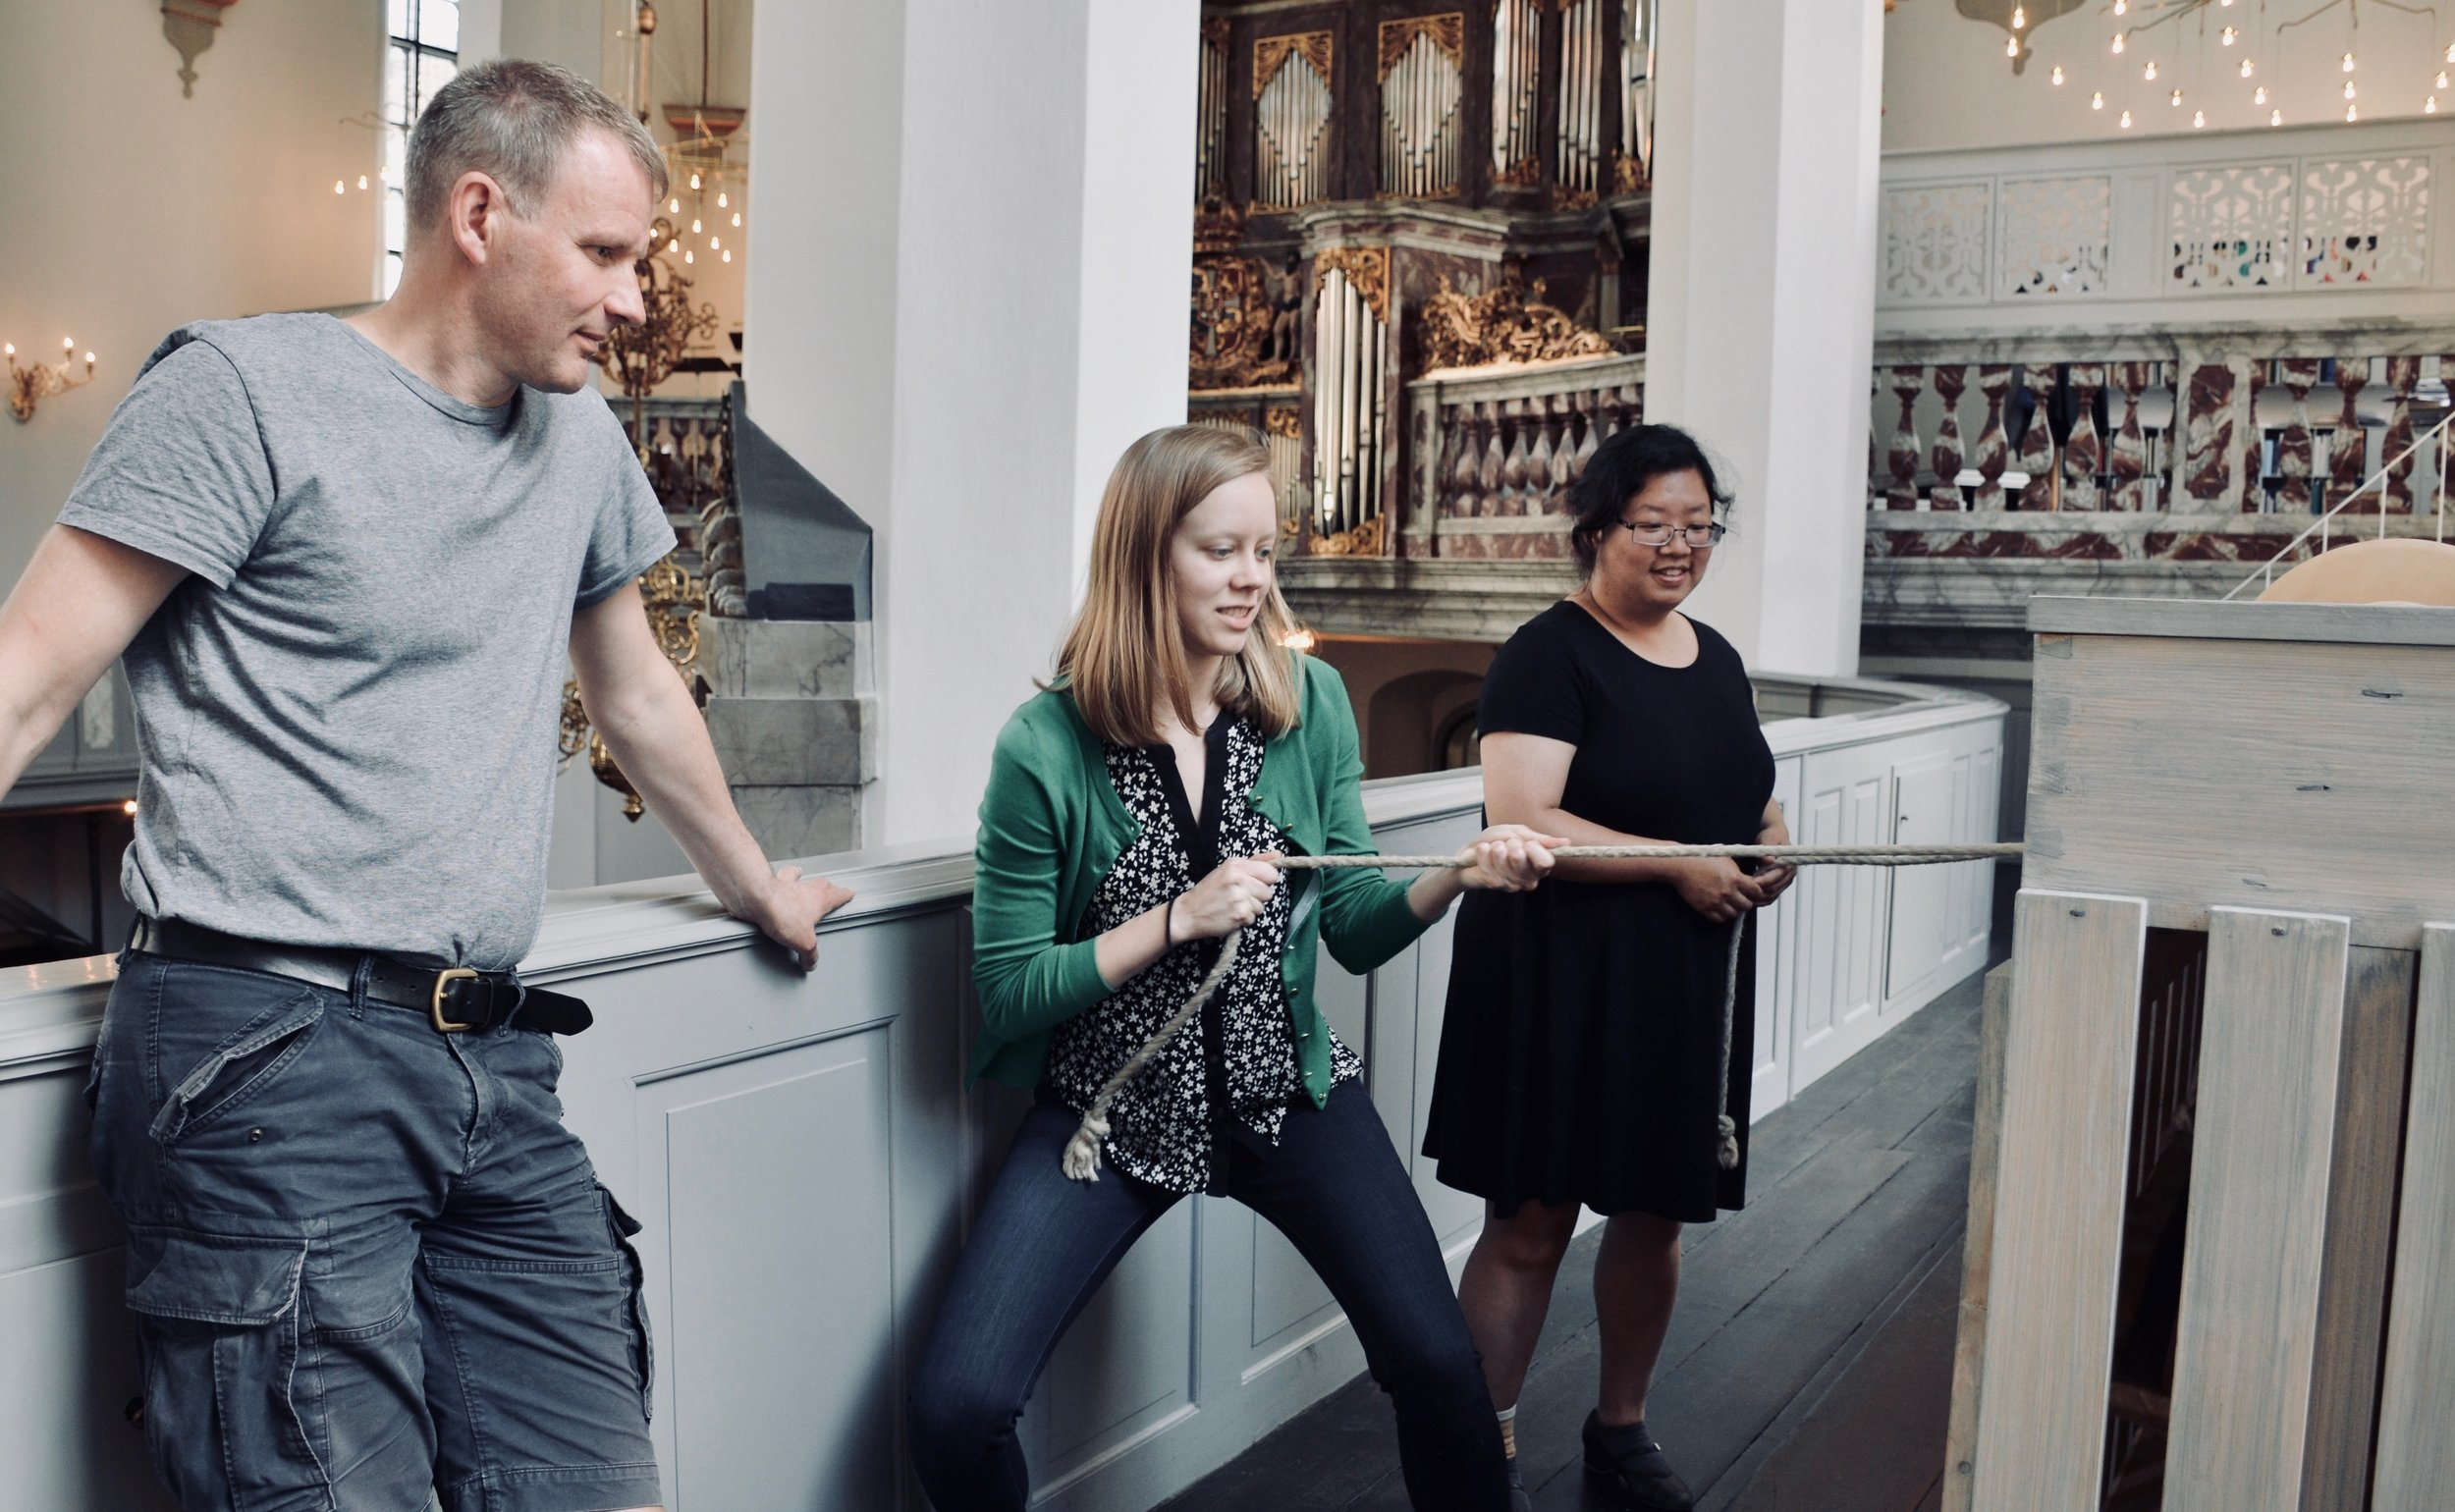 Laura Gullett pumps the bellows for the Italian baroque organ in Trinitatis Kirke, Copenhagen.